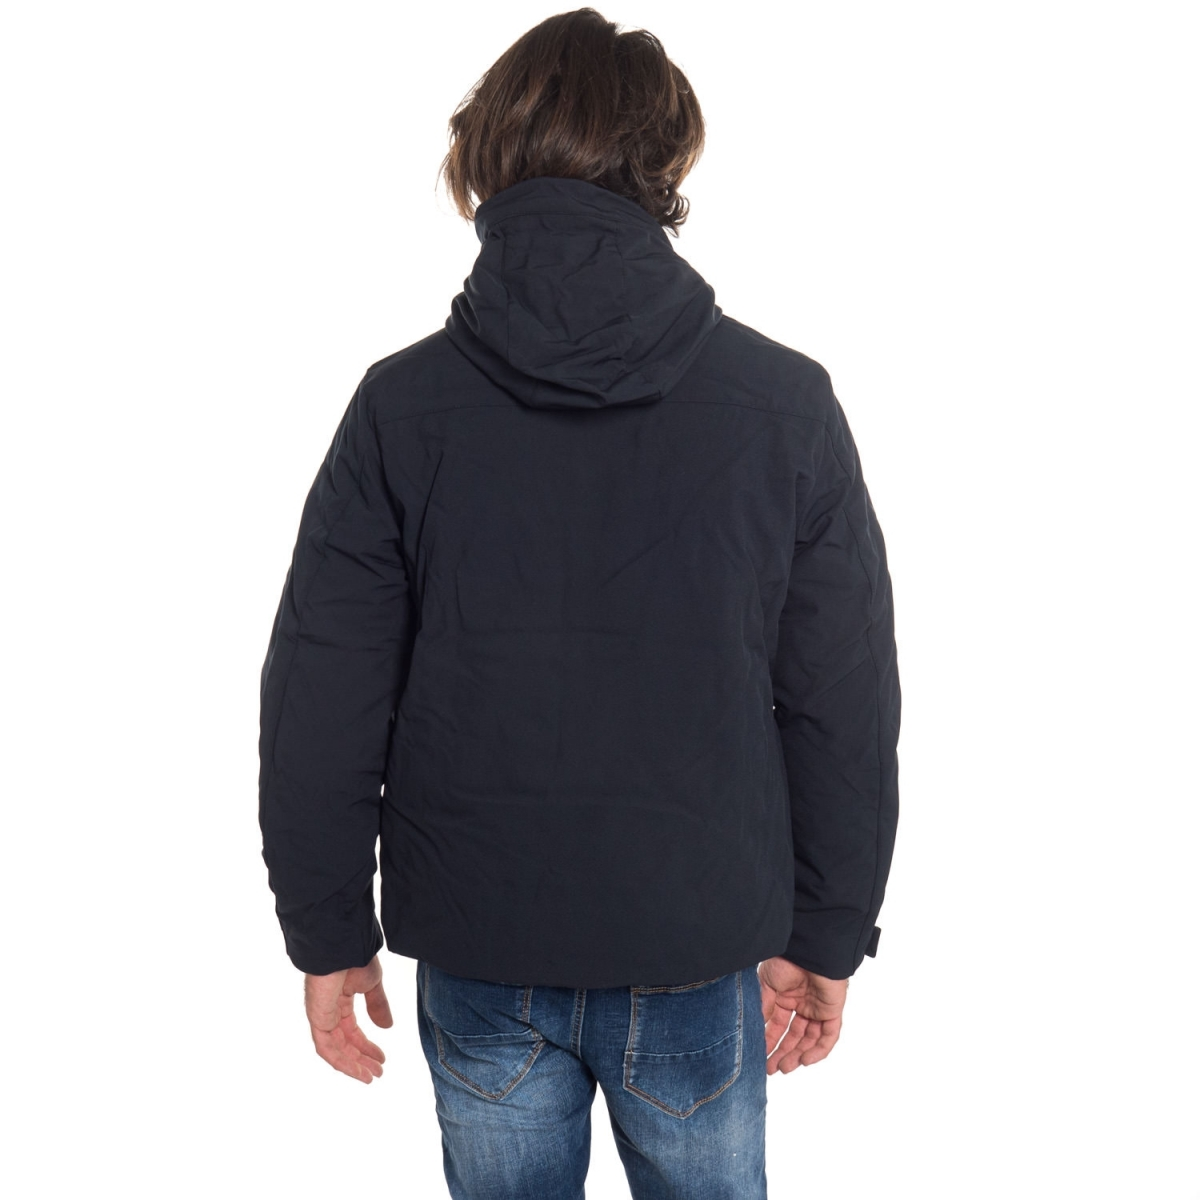 abbigliamento Giubbini uomo Giubbotto imbottito LPBBK29005 LANDEK PARK Cafedelmar Shop